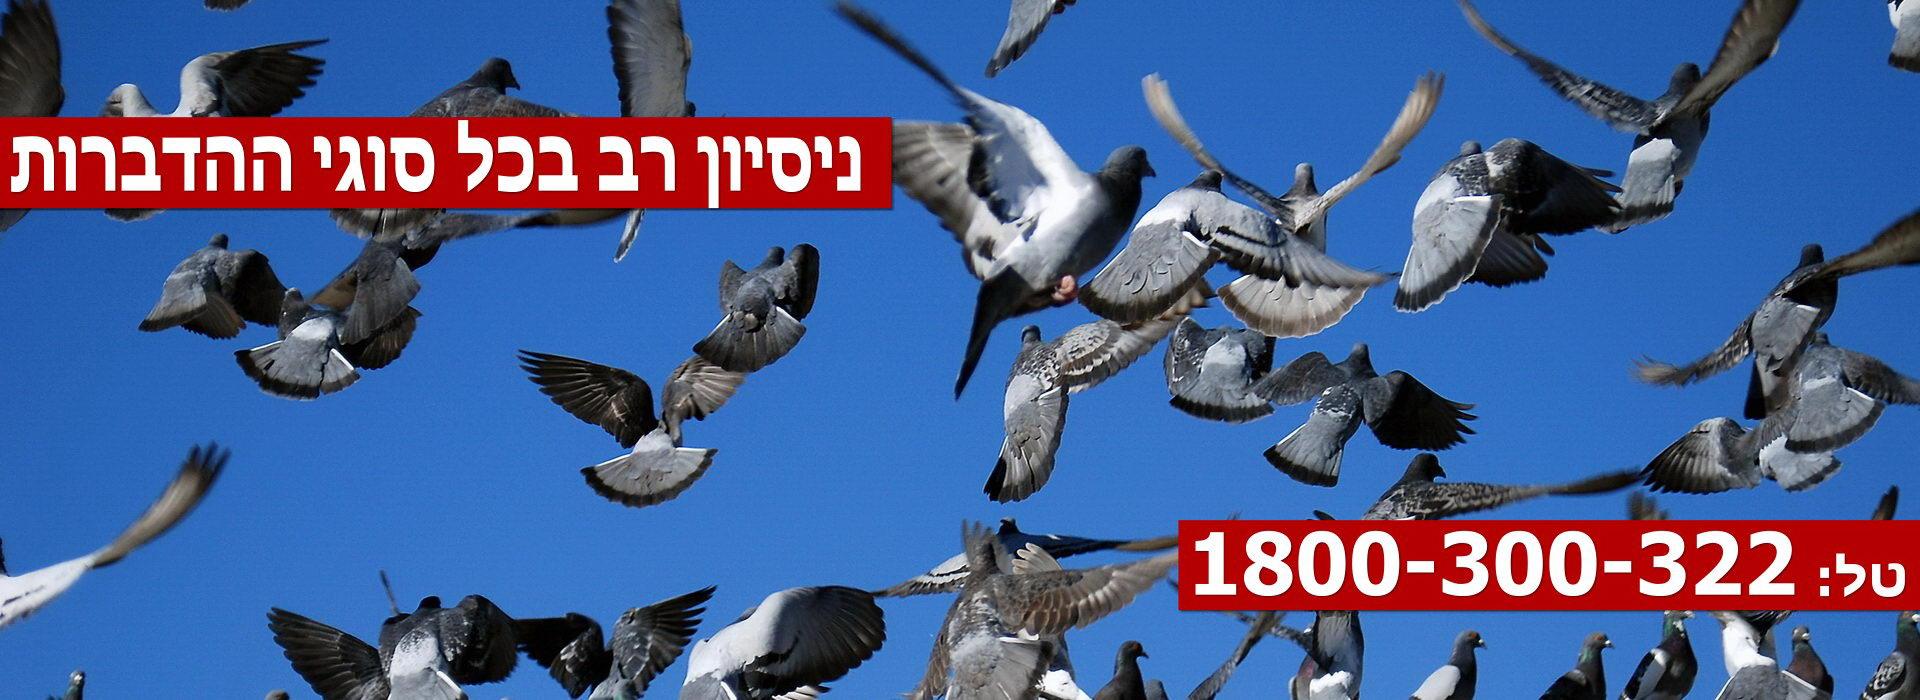 Pest-Control-Haifa-Slider3